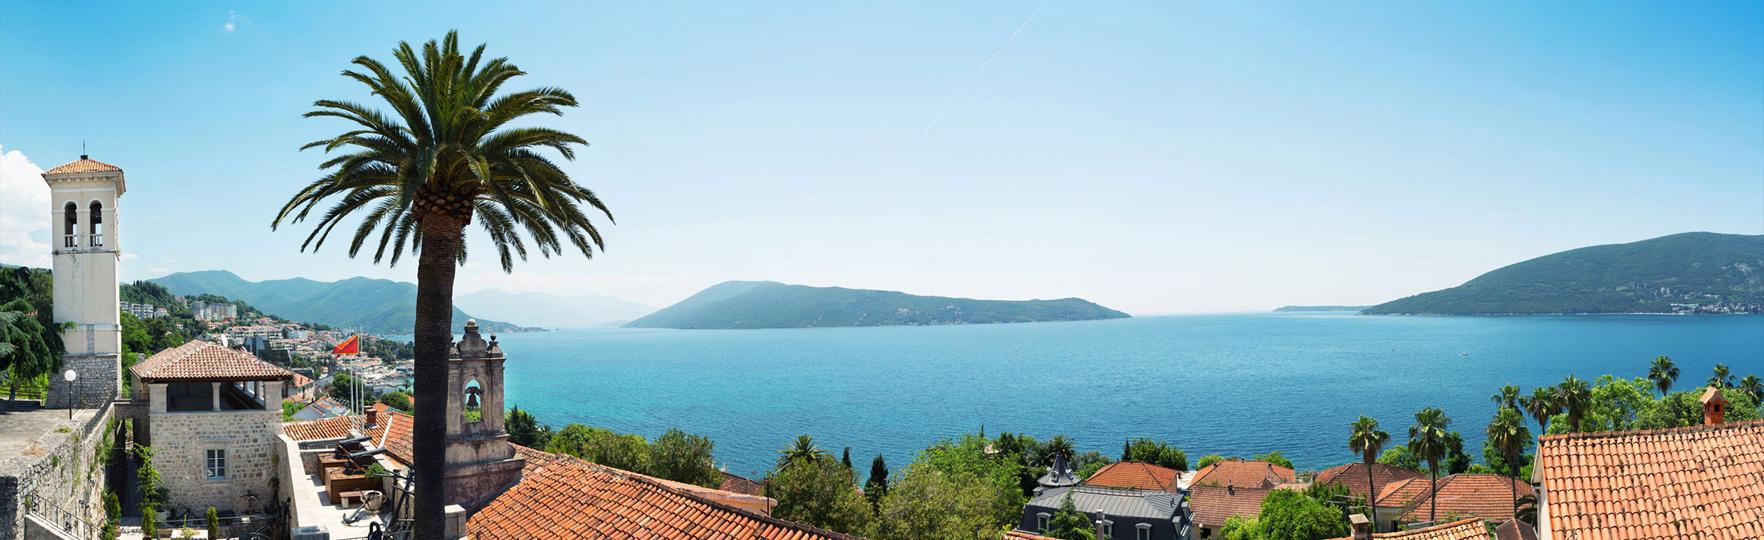 Montenegro Office